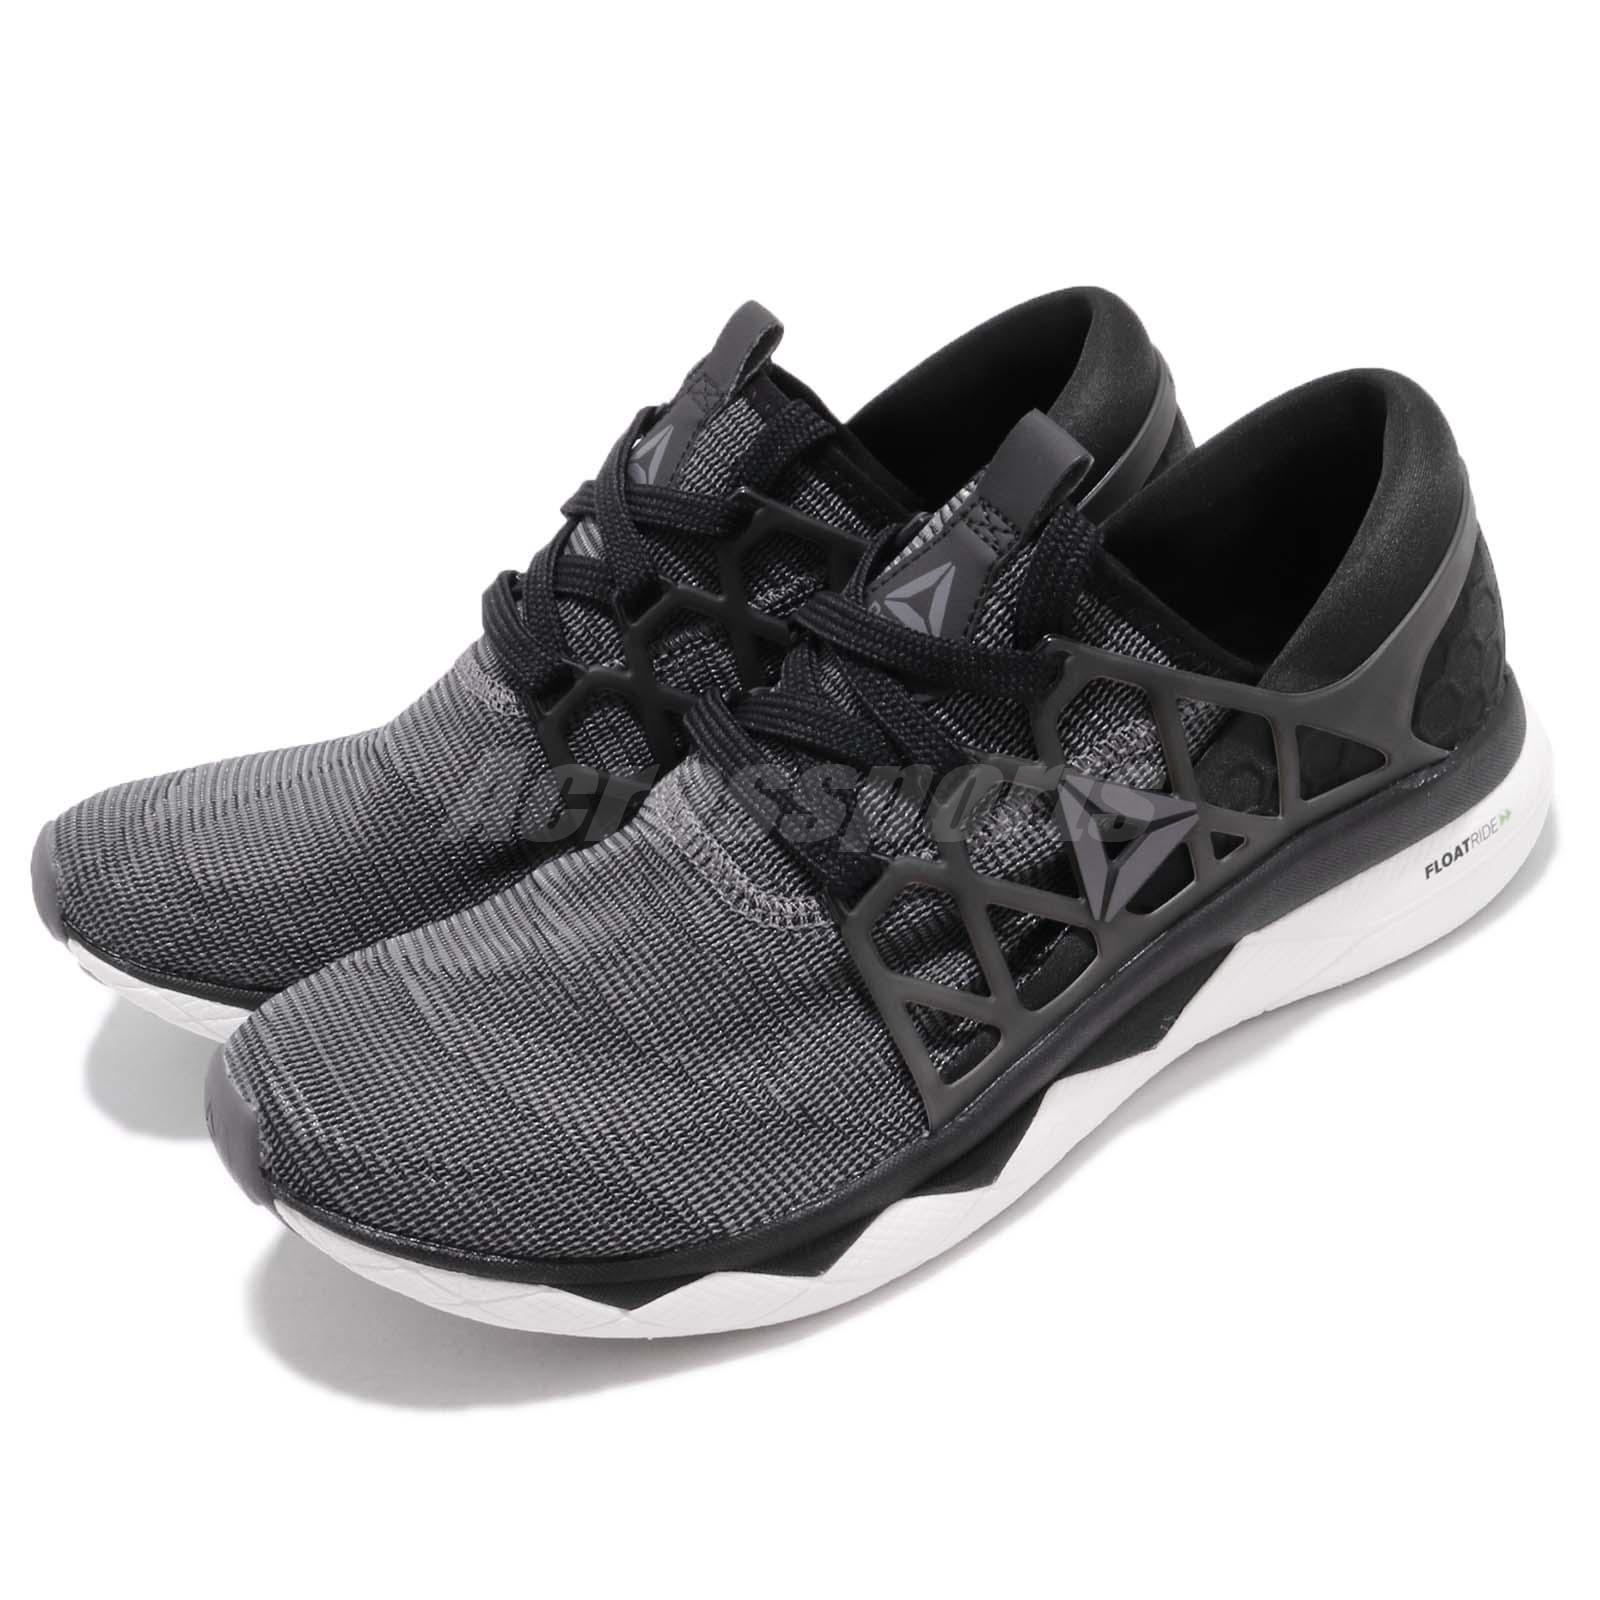 meet f8942 5db4a Details about Reebok Floatride Run Flexweave Black White Grey Men Running  Shoes Sneaker CN5227